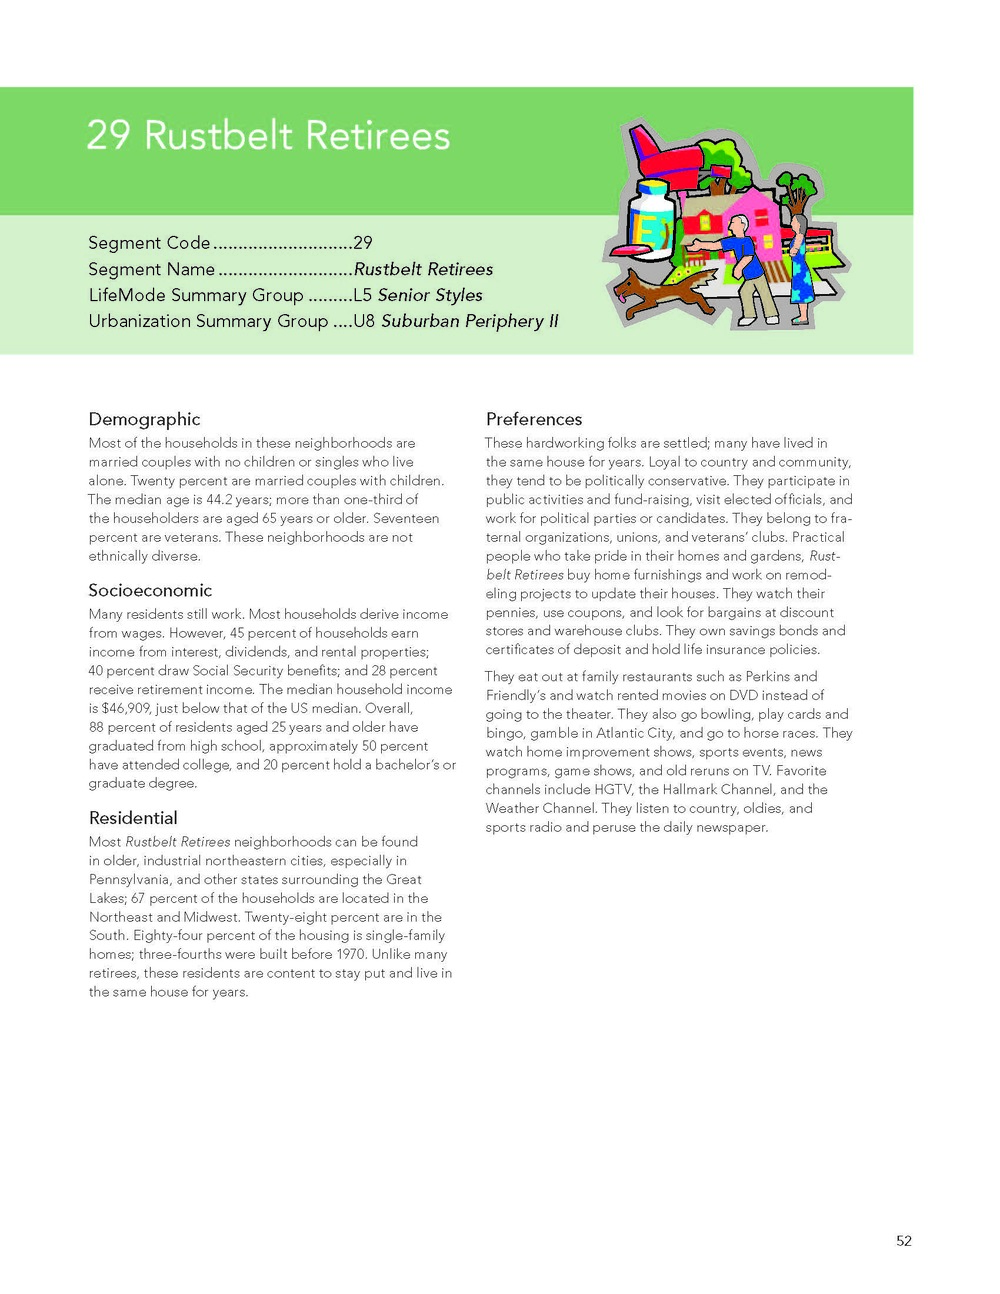 tapestry-segmentation_Page_55.jpg